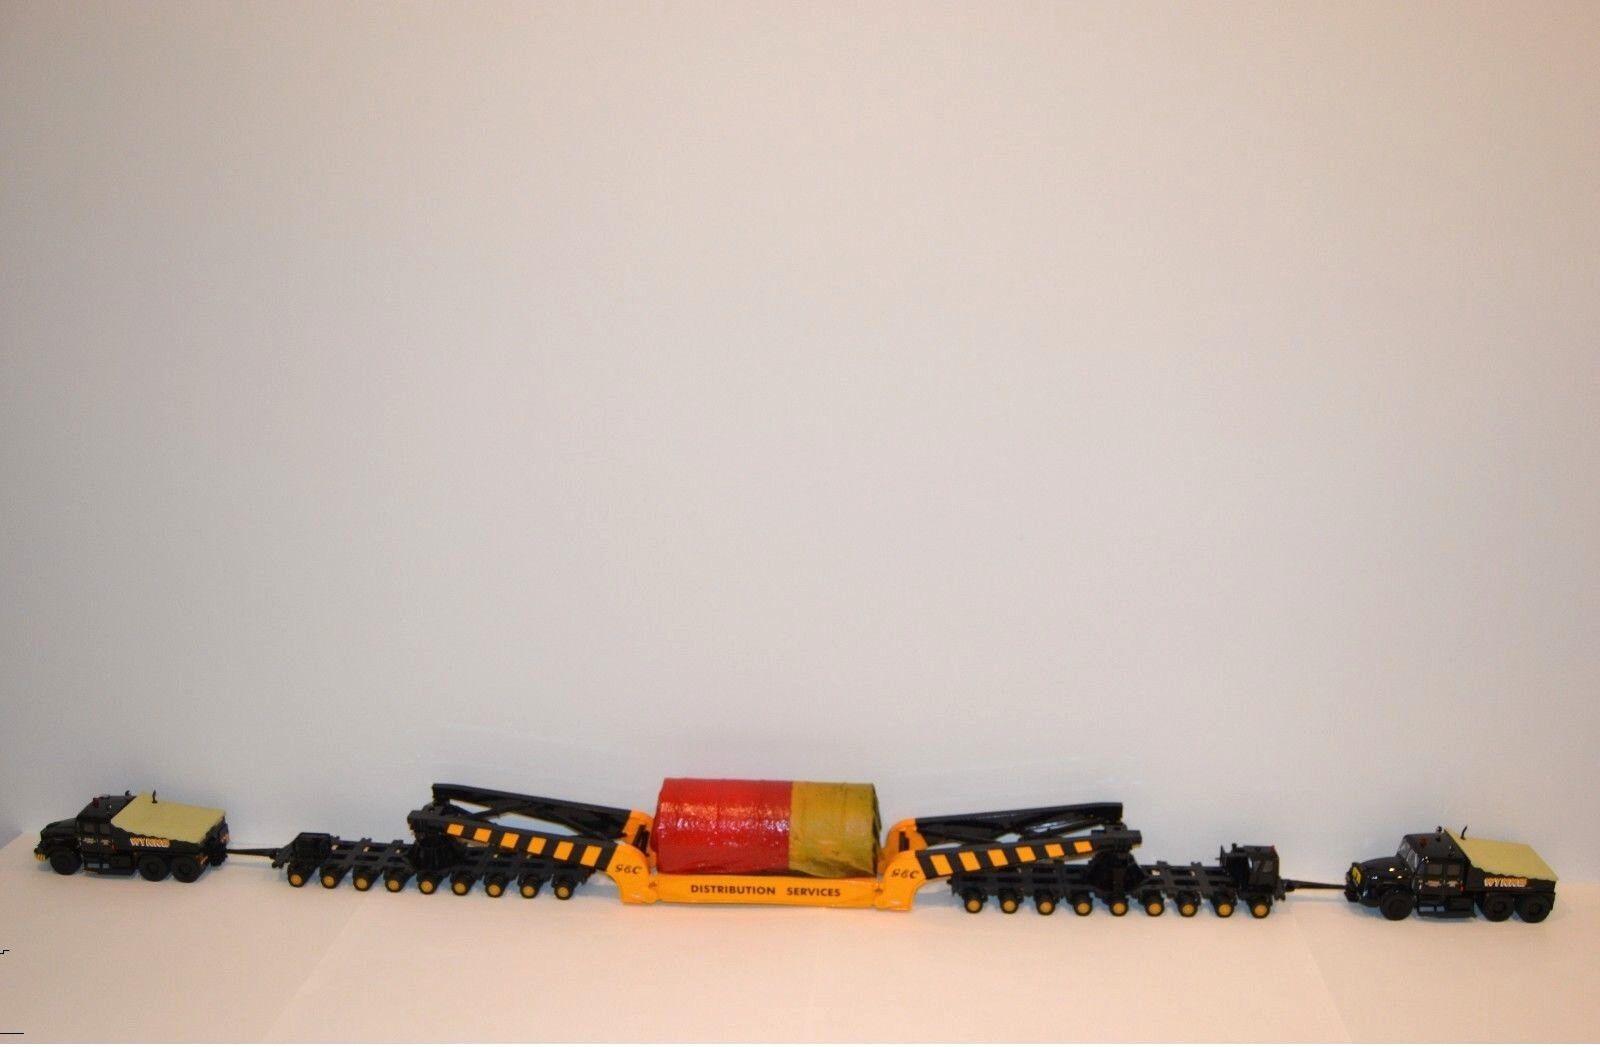 Corgi Heavy Haulage Scammell Contractor x 2  Wynns  Stator Core 1/50 Réf. 18003.